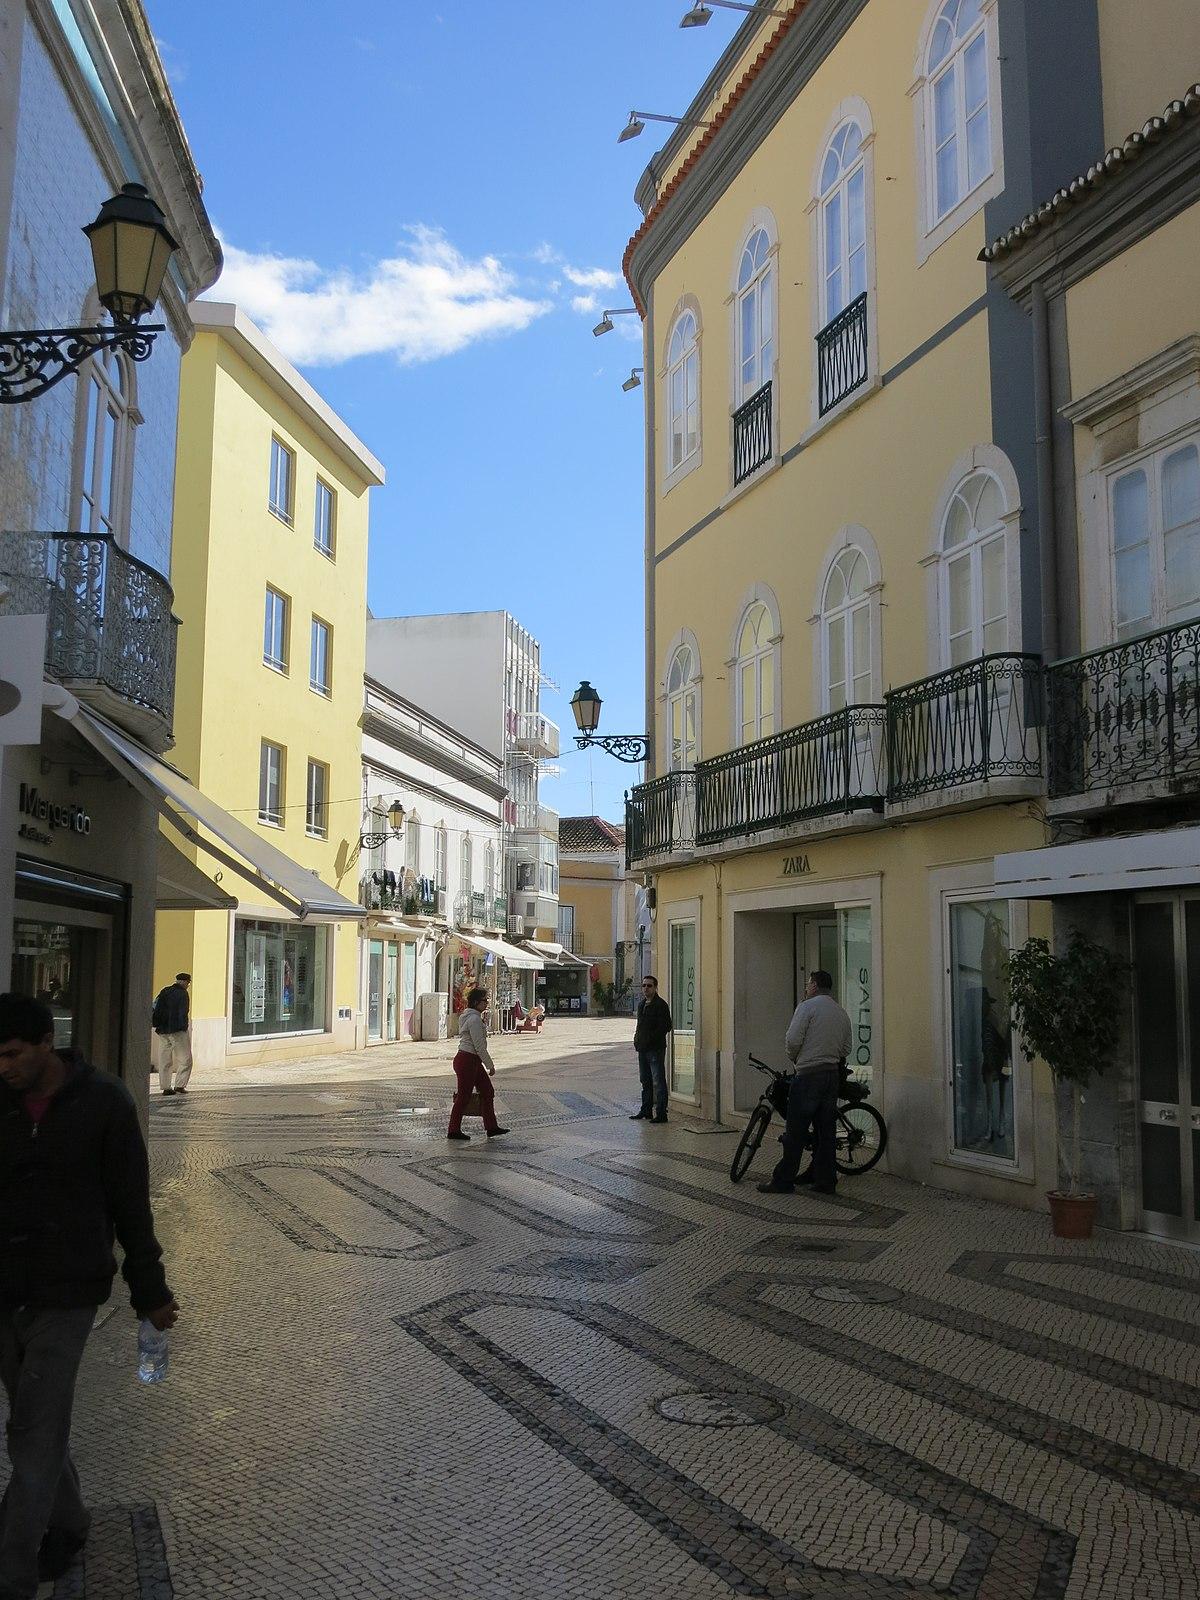 Faro  Travel guide at Wikivoyage